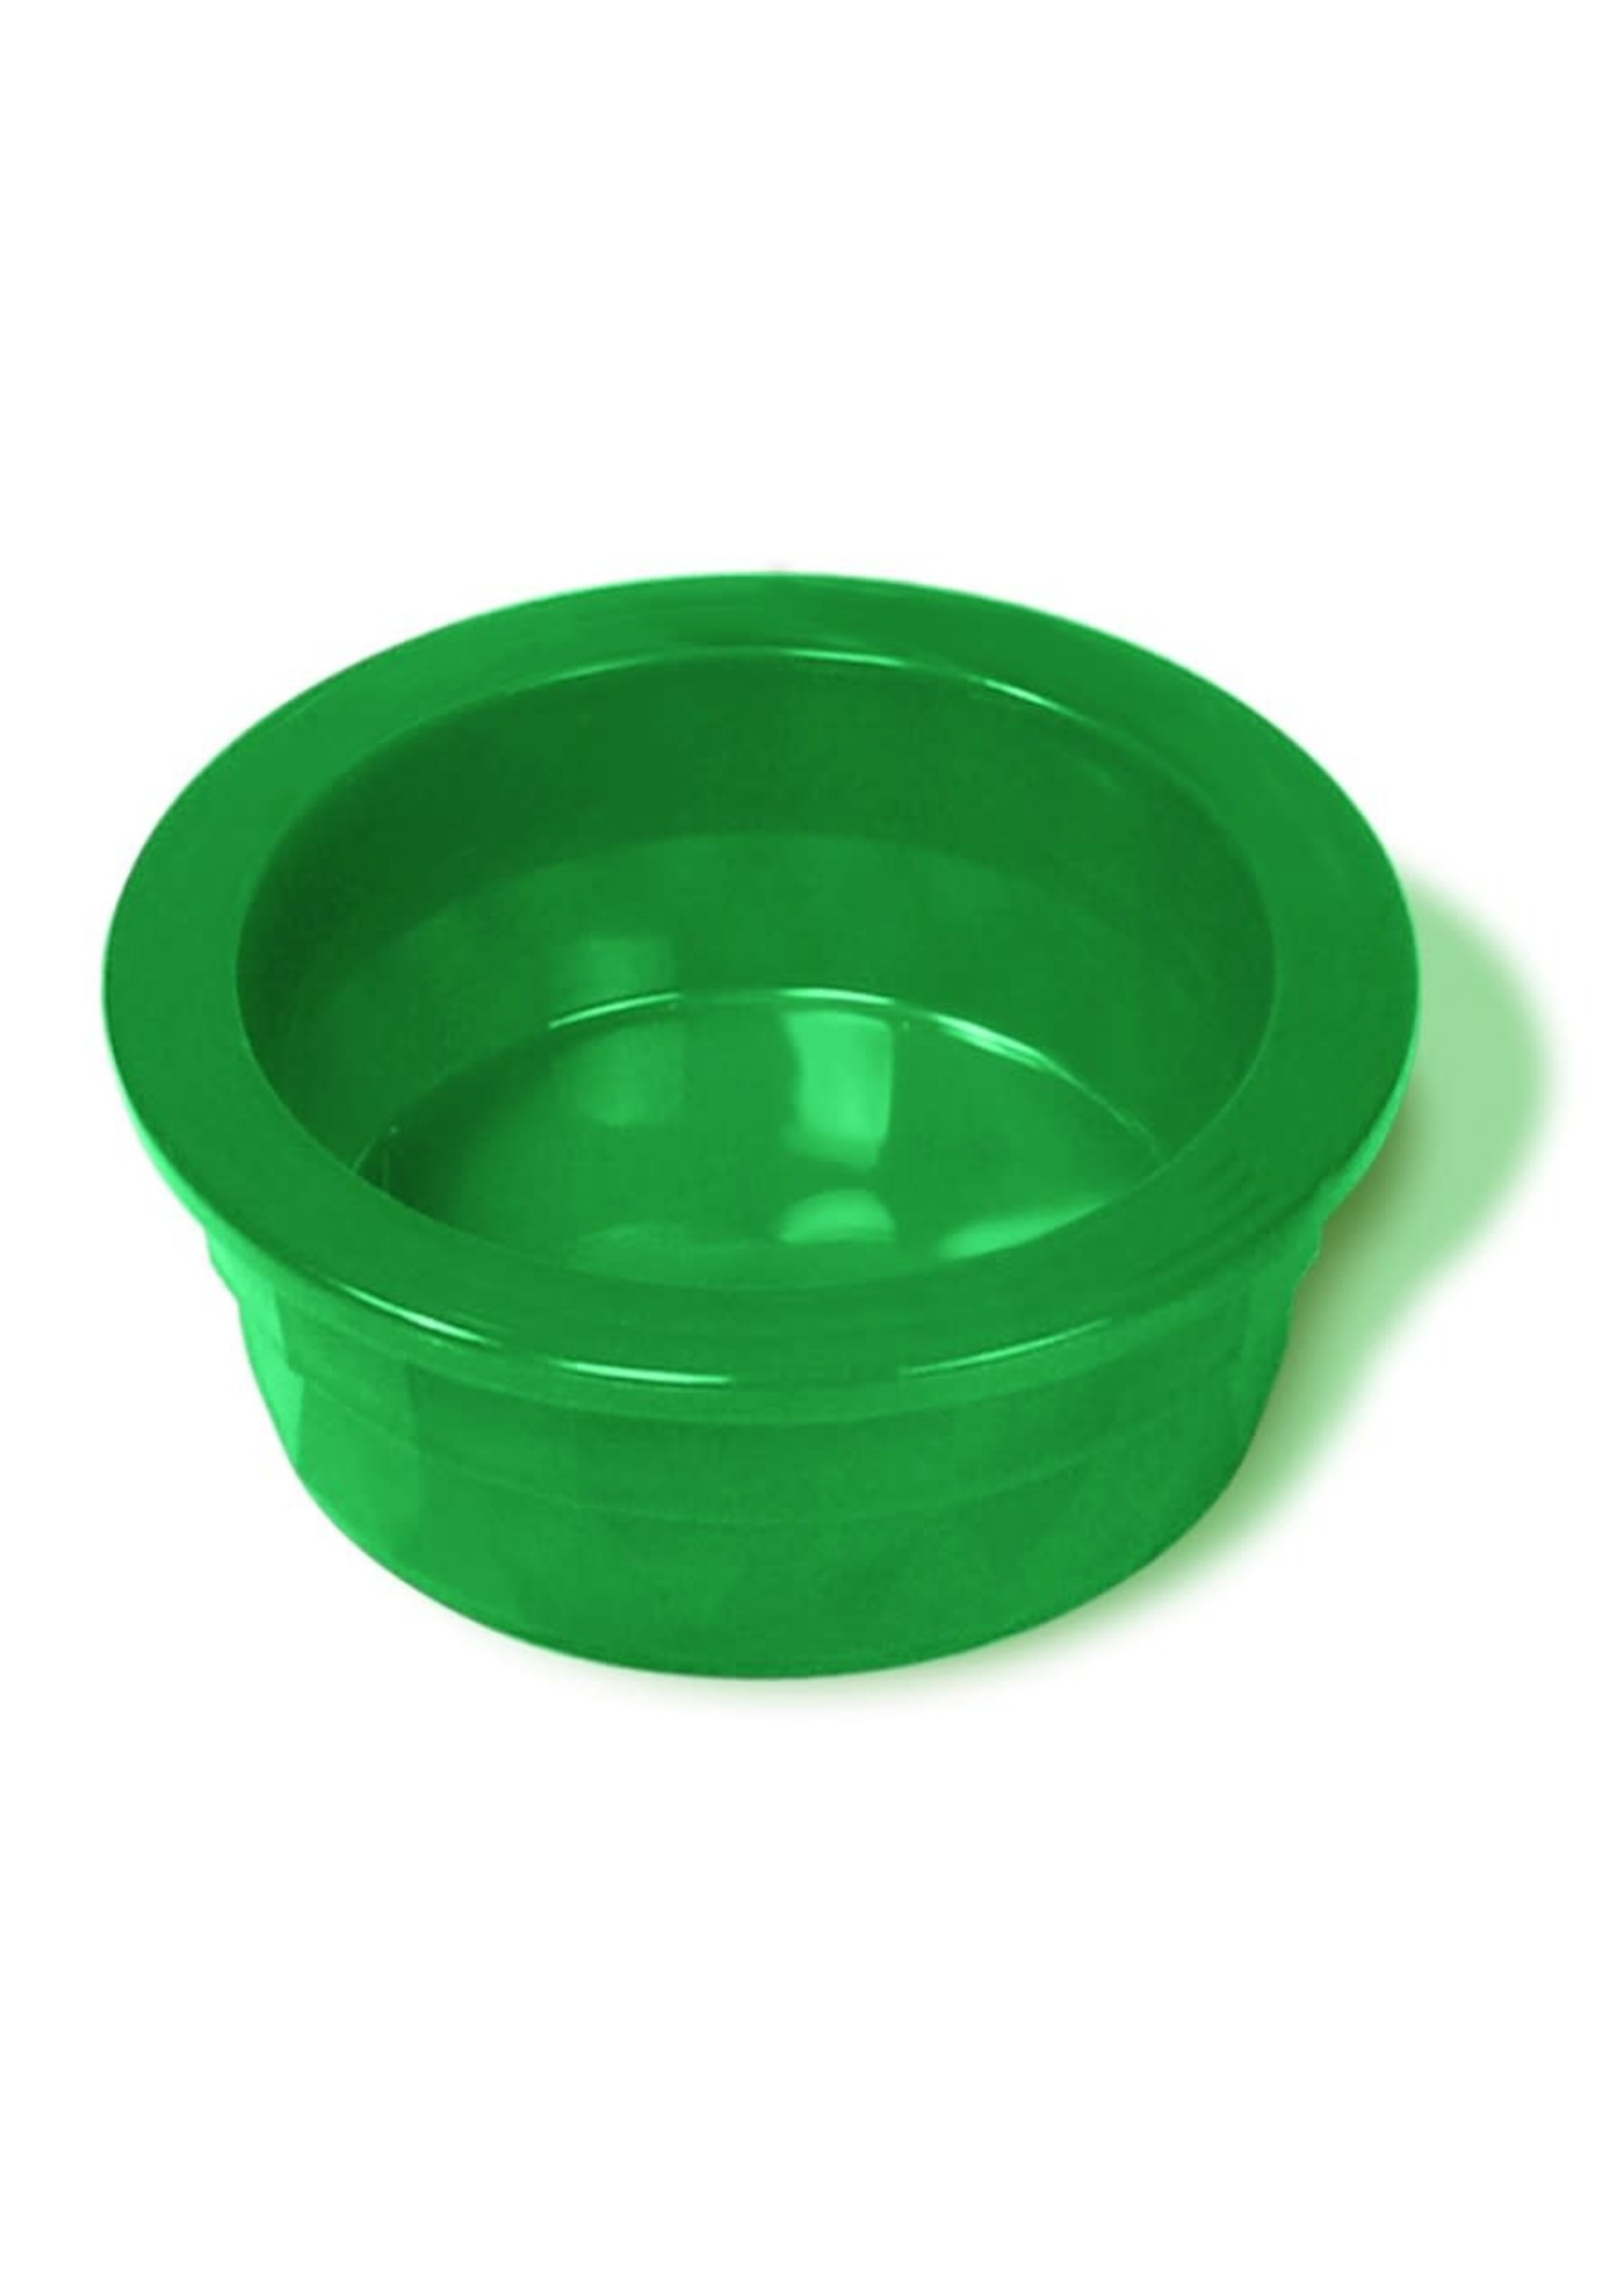 Van Ness VNS Translucent Crock Dish 9.5oz